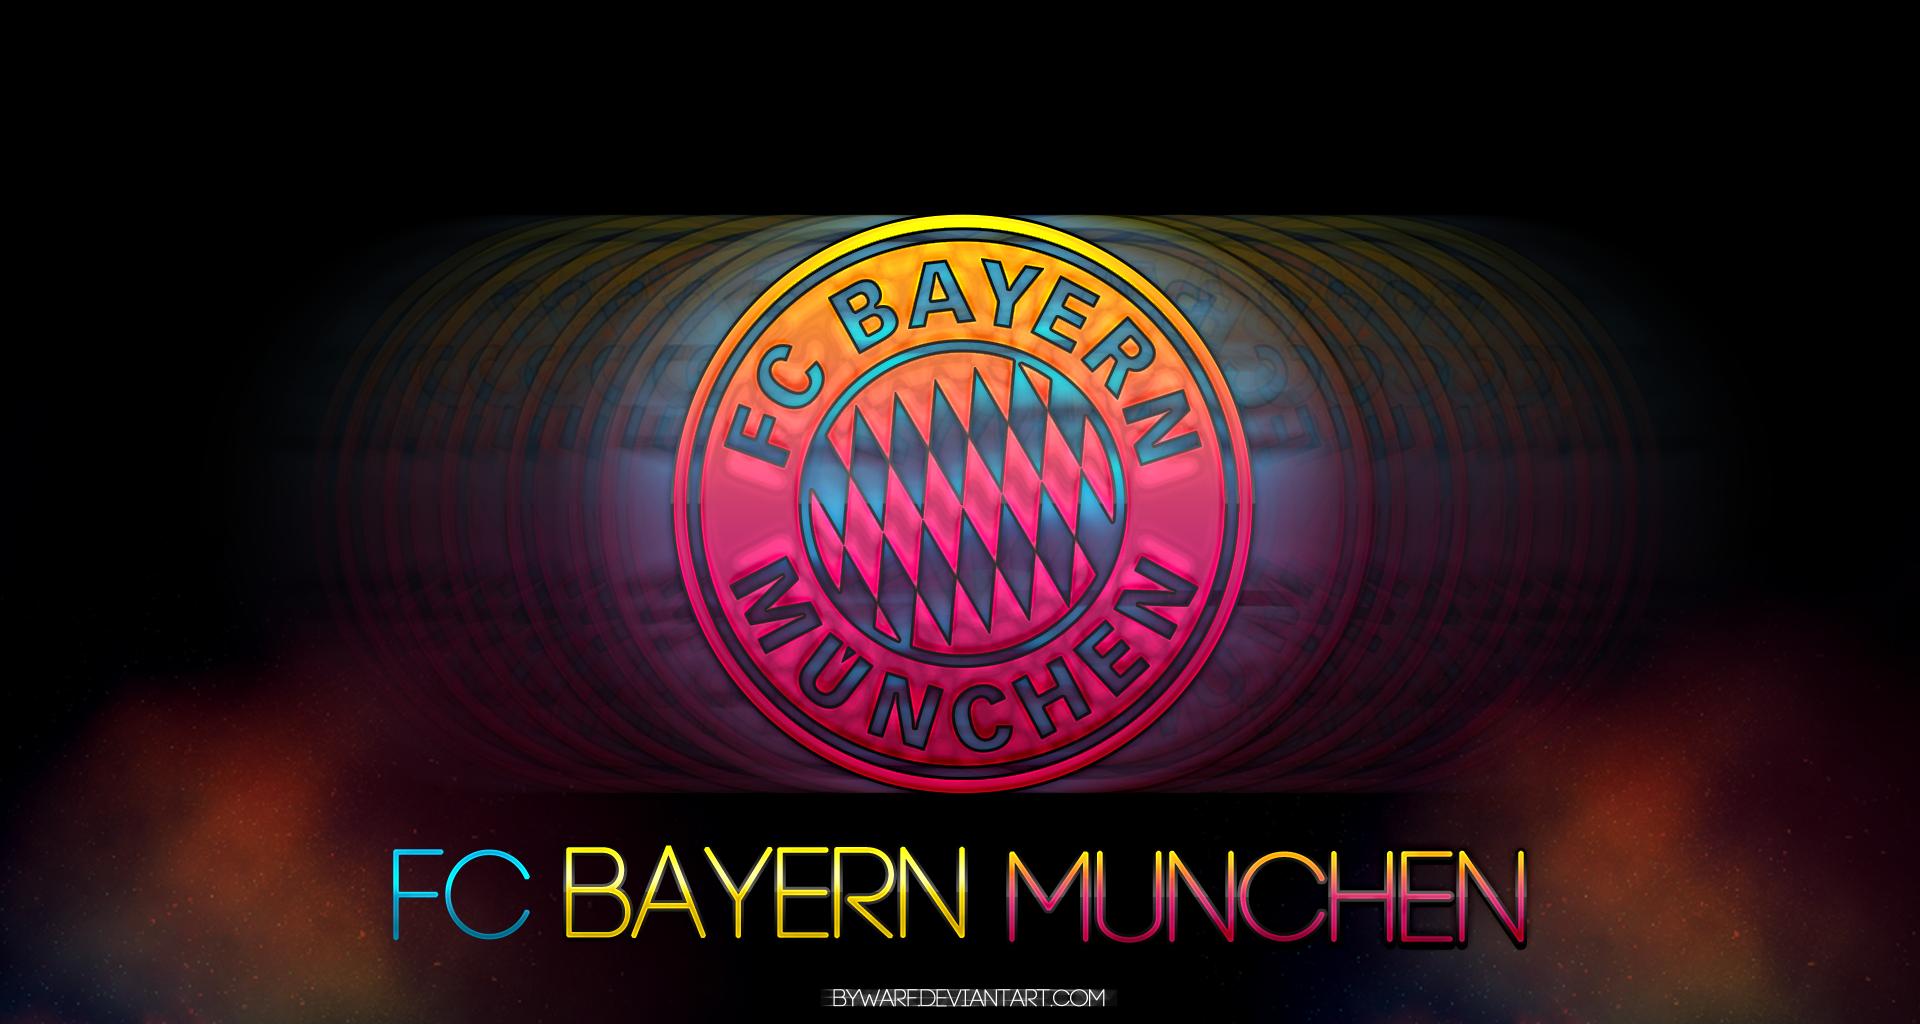 Fc bayern wallpaper picture gallery fc bayern munchen wallpaper by bywarf on deviantart voltagebd Images